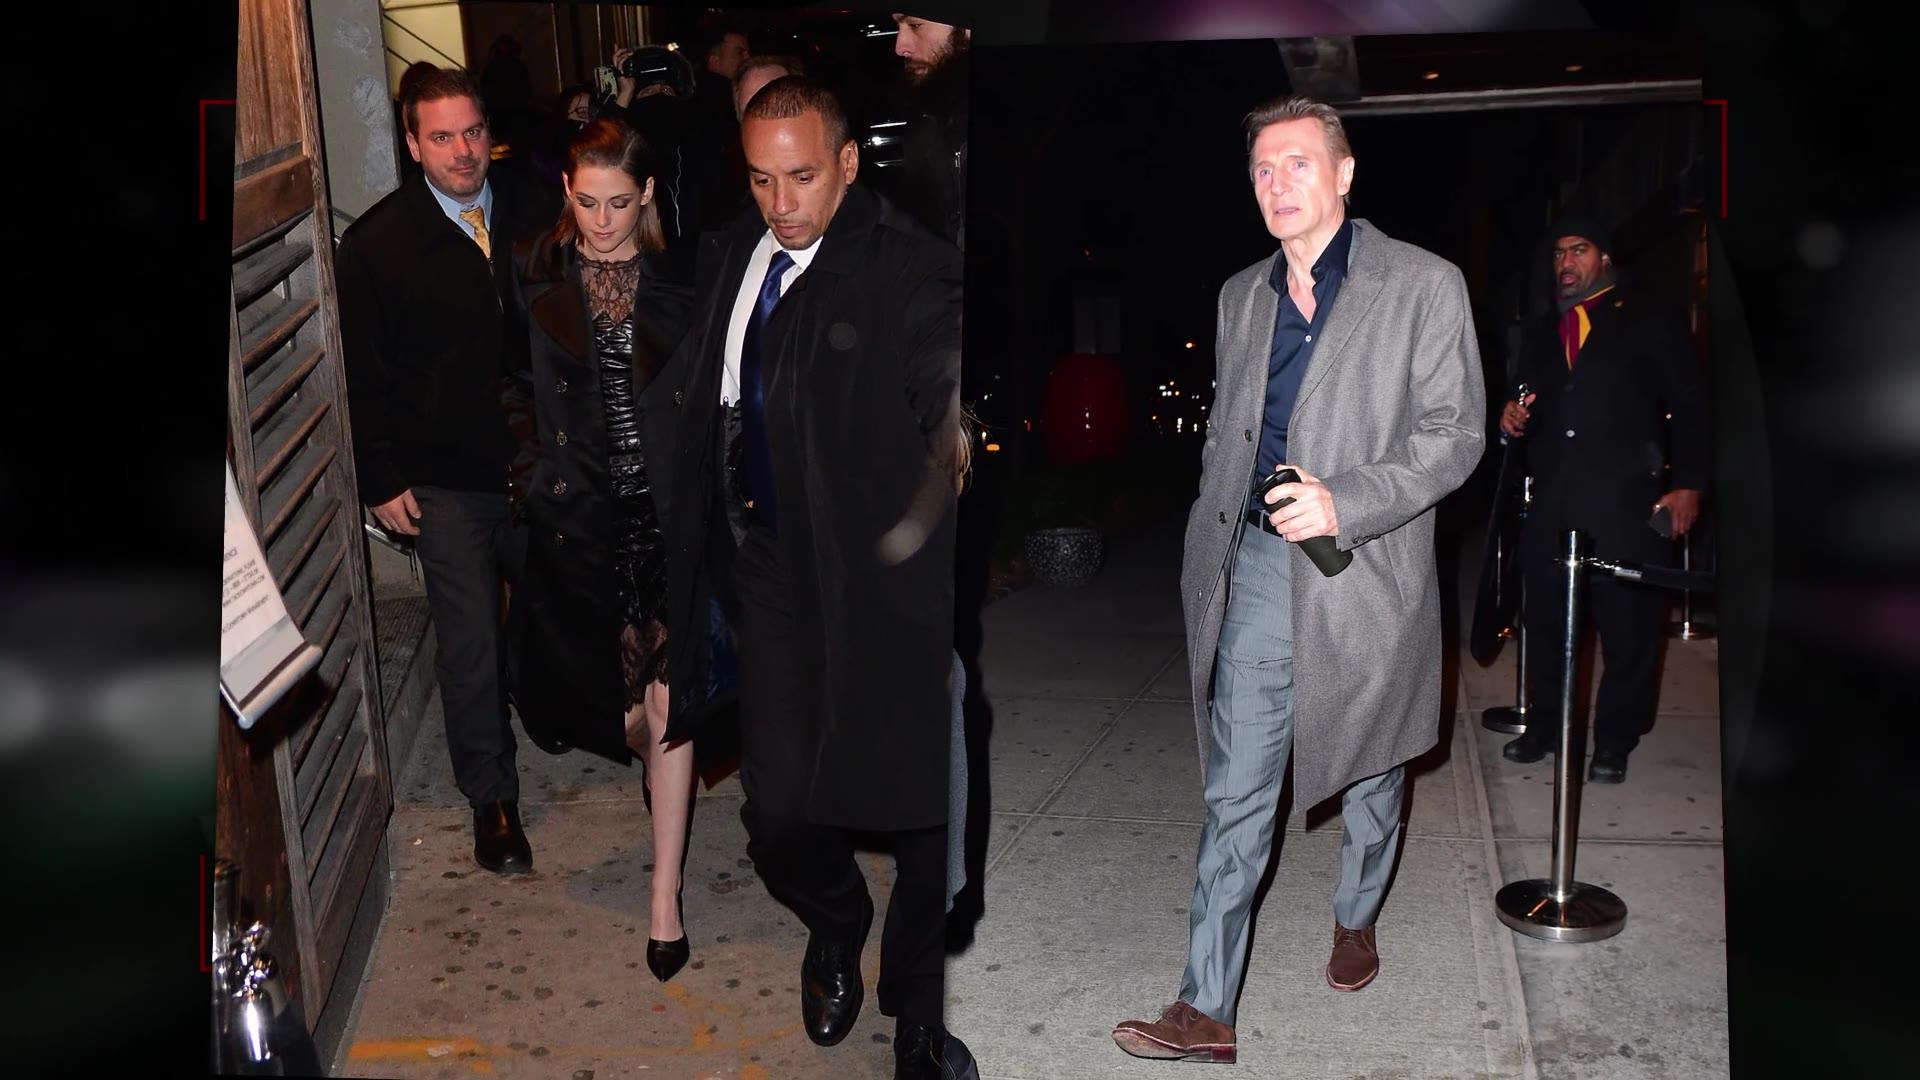 Report: Liam Neeson is Dating Kristen Stewart